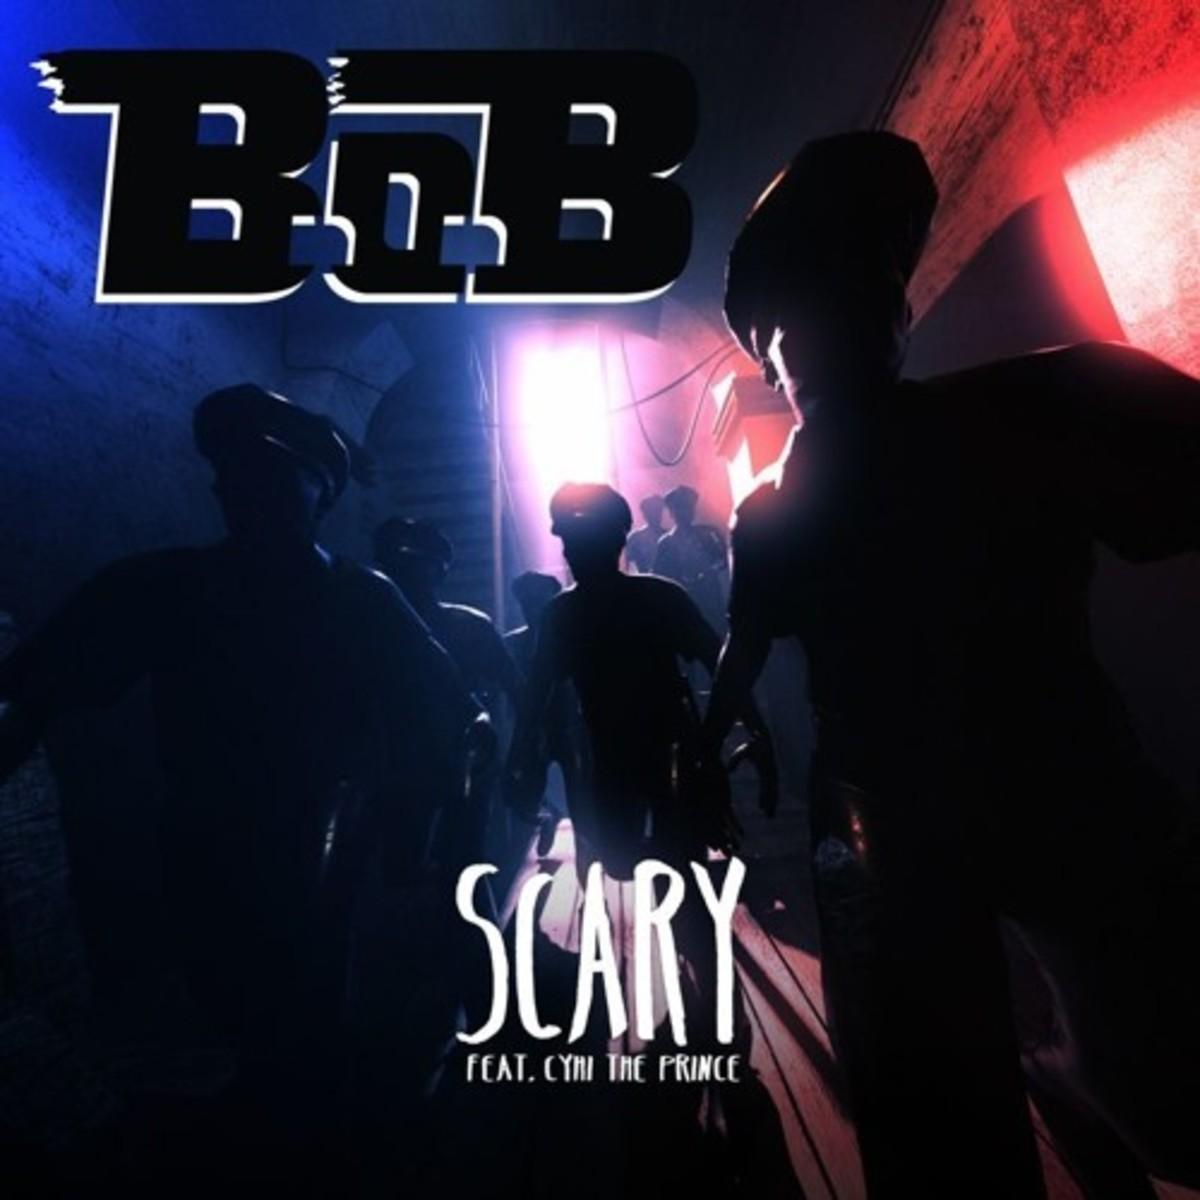 bob-scary.jpg